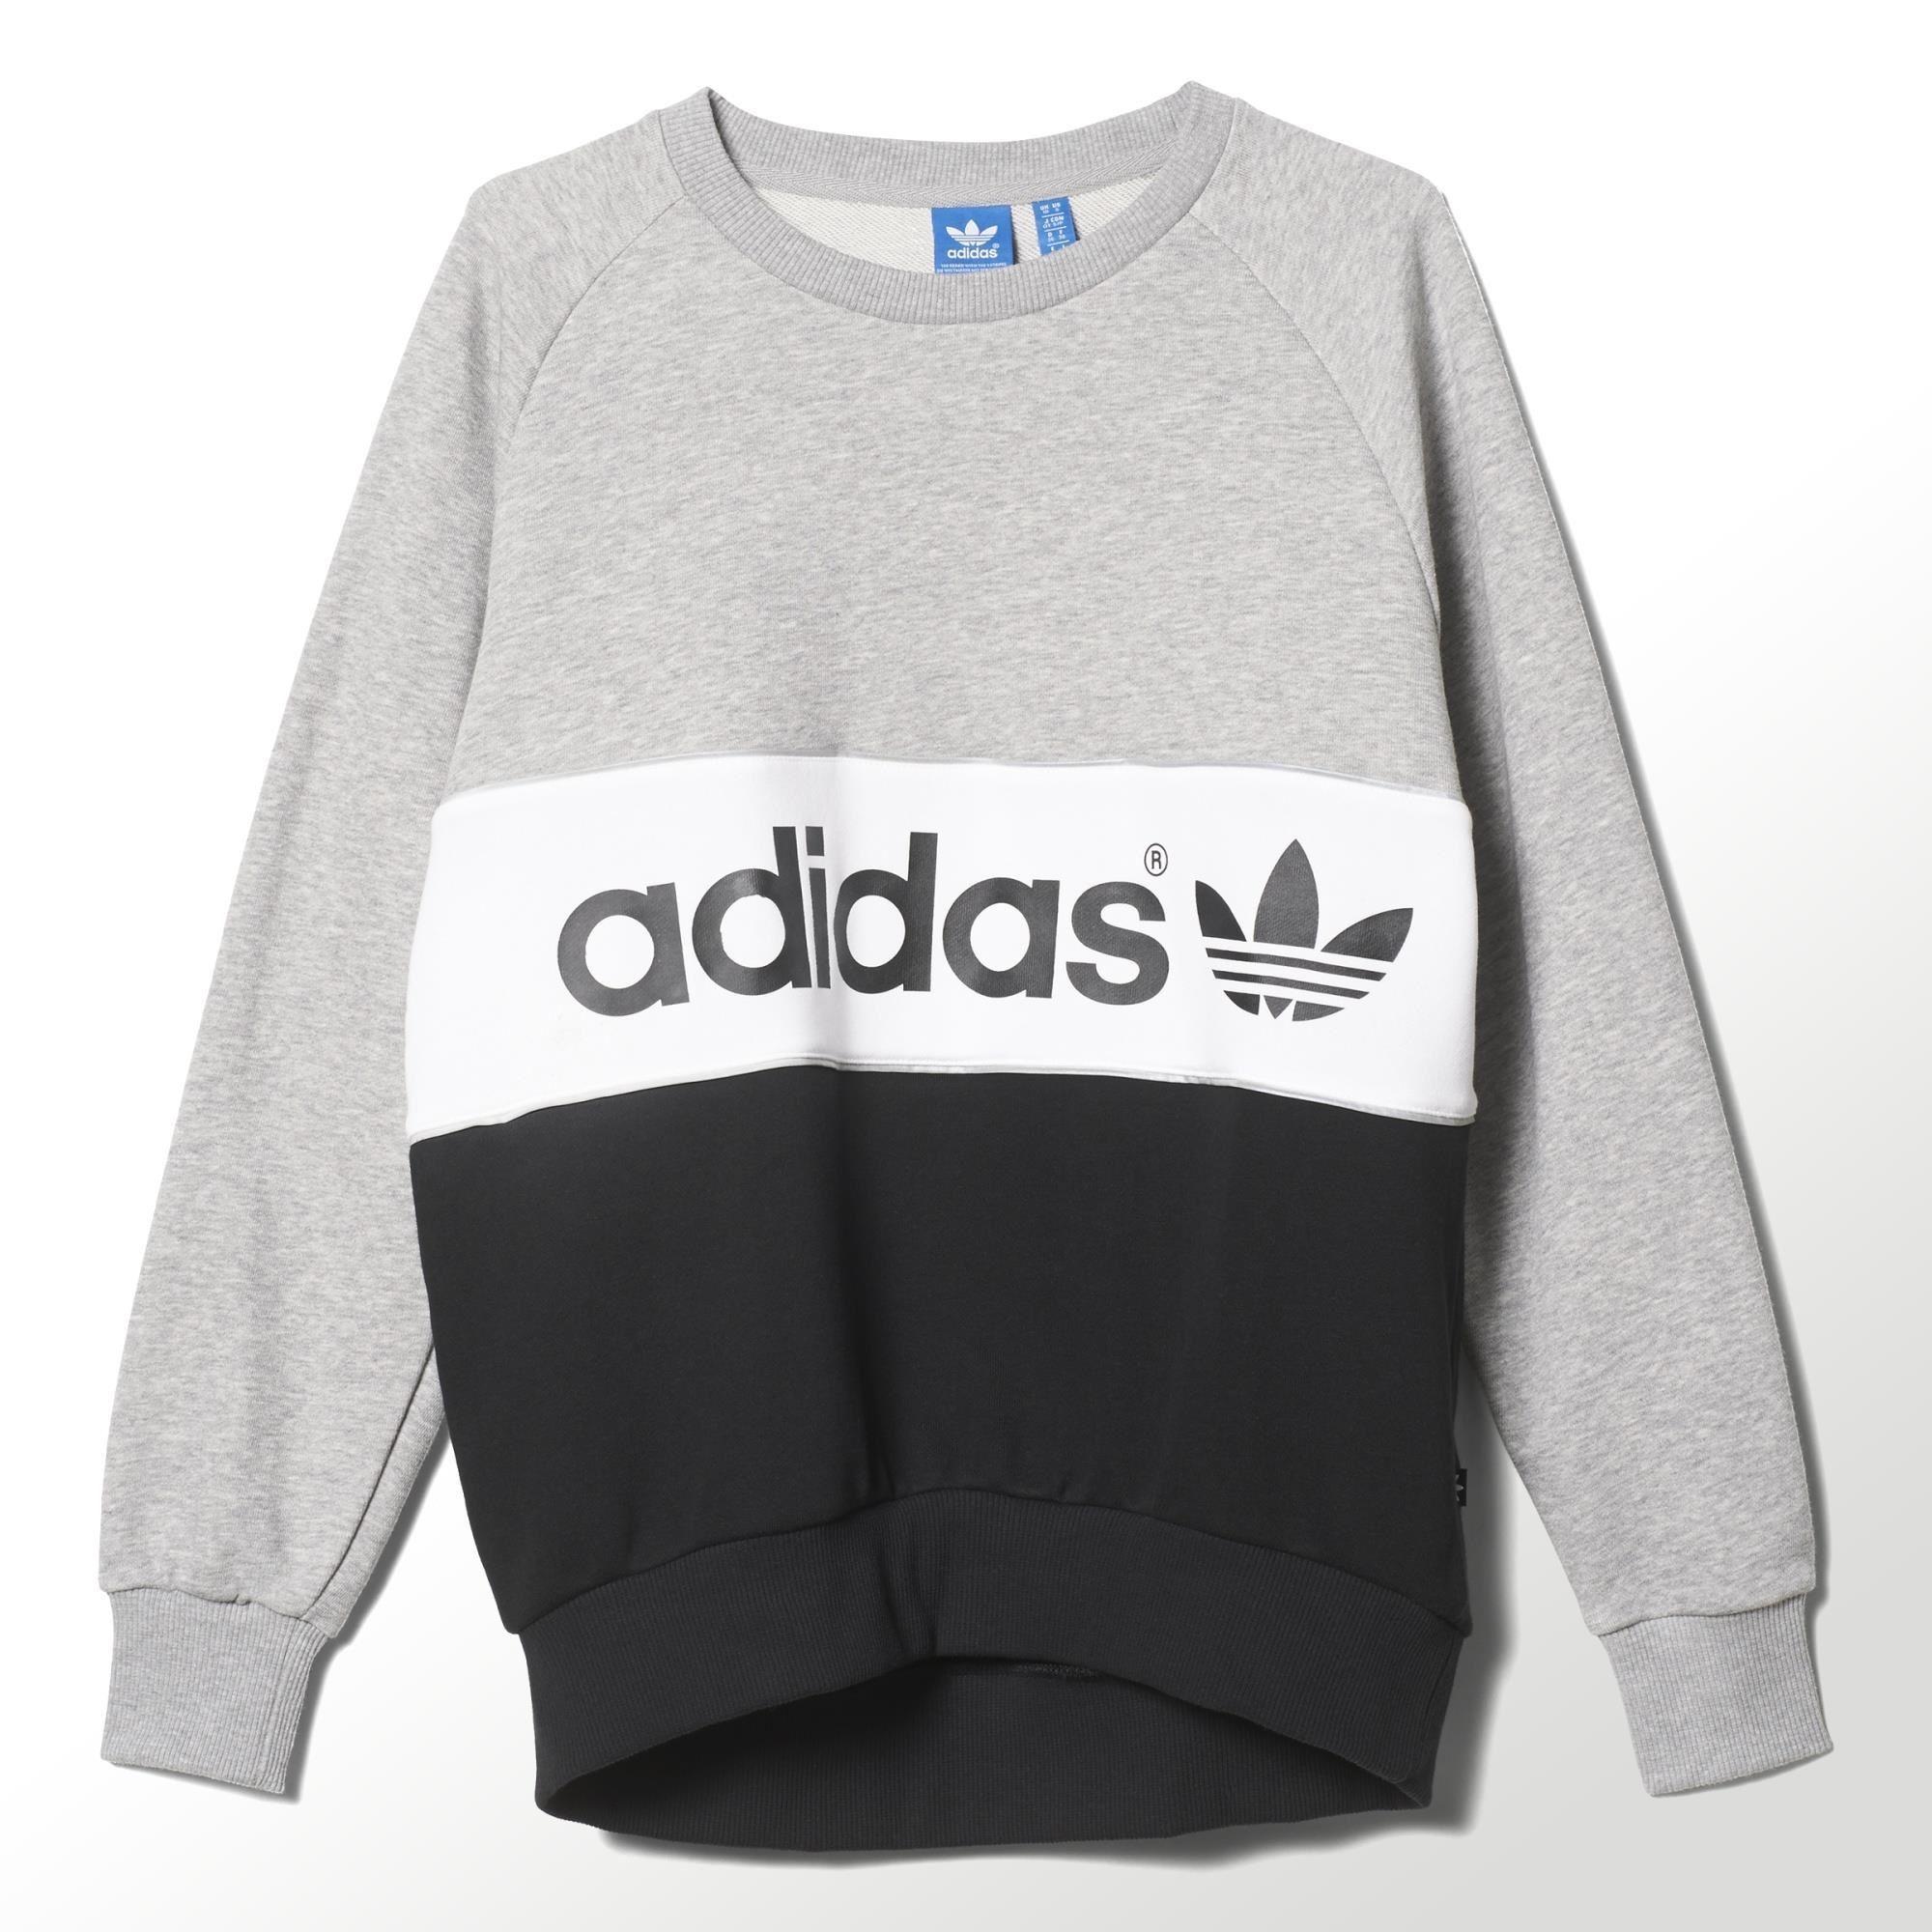 Sweater Moda Pinterest Hombre City Adidas Jackets Casual 5wvpnqA